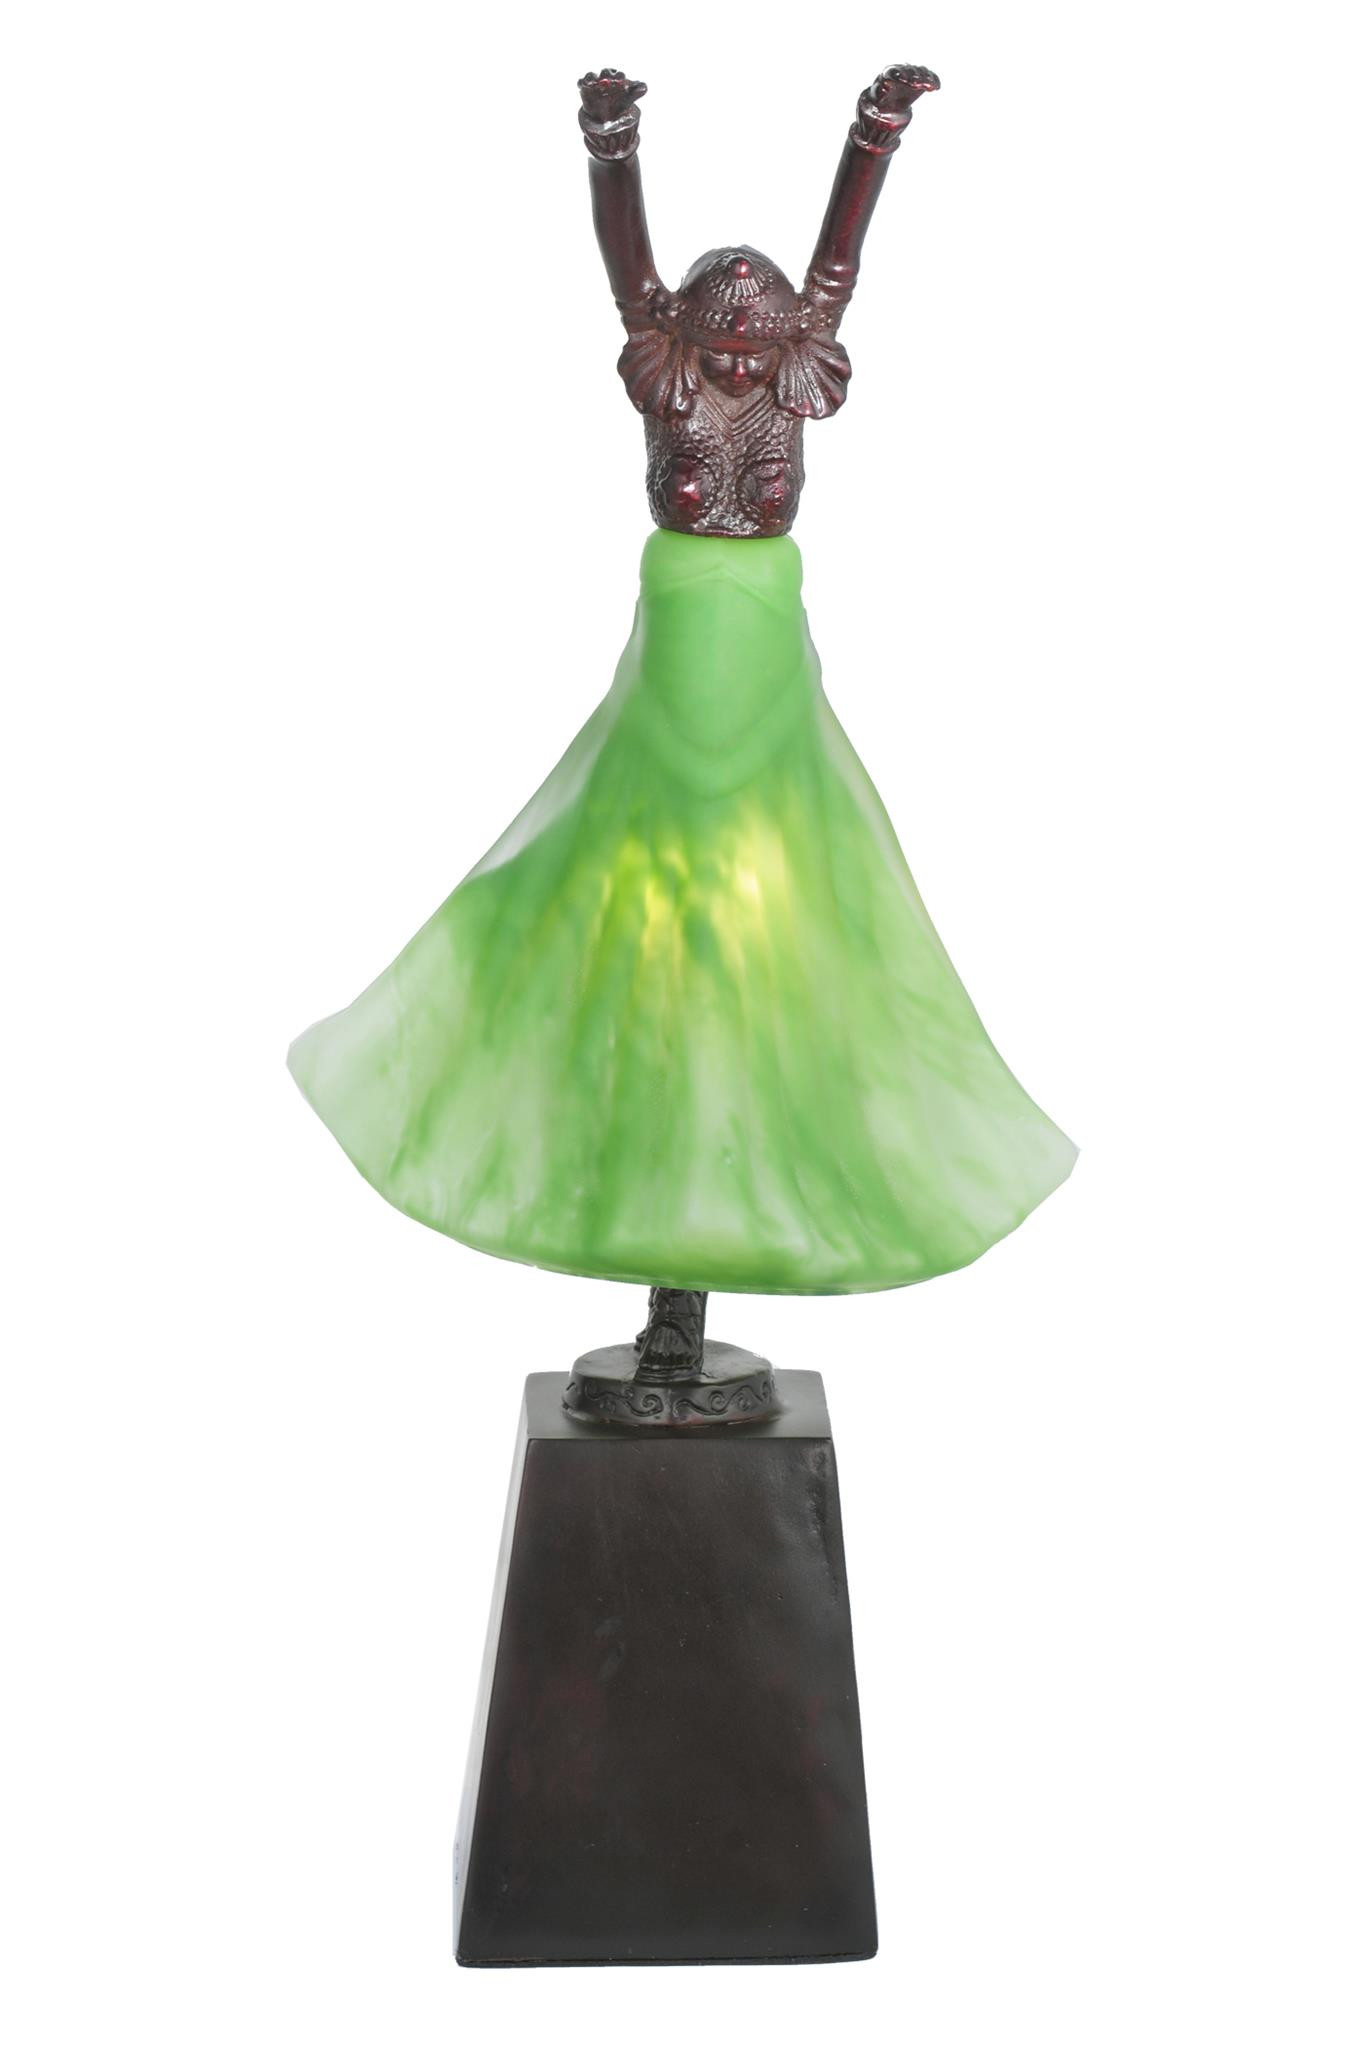 Meyda Tiffany 24089 Specialty Accent Table Lamp by Meyda Tiffany